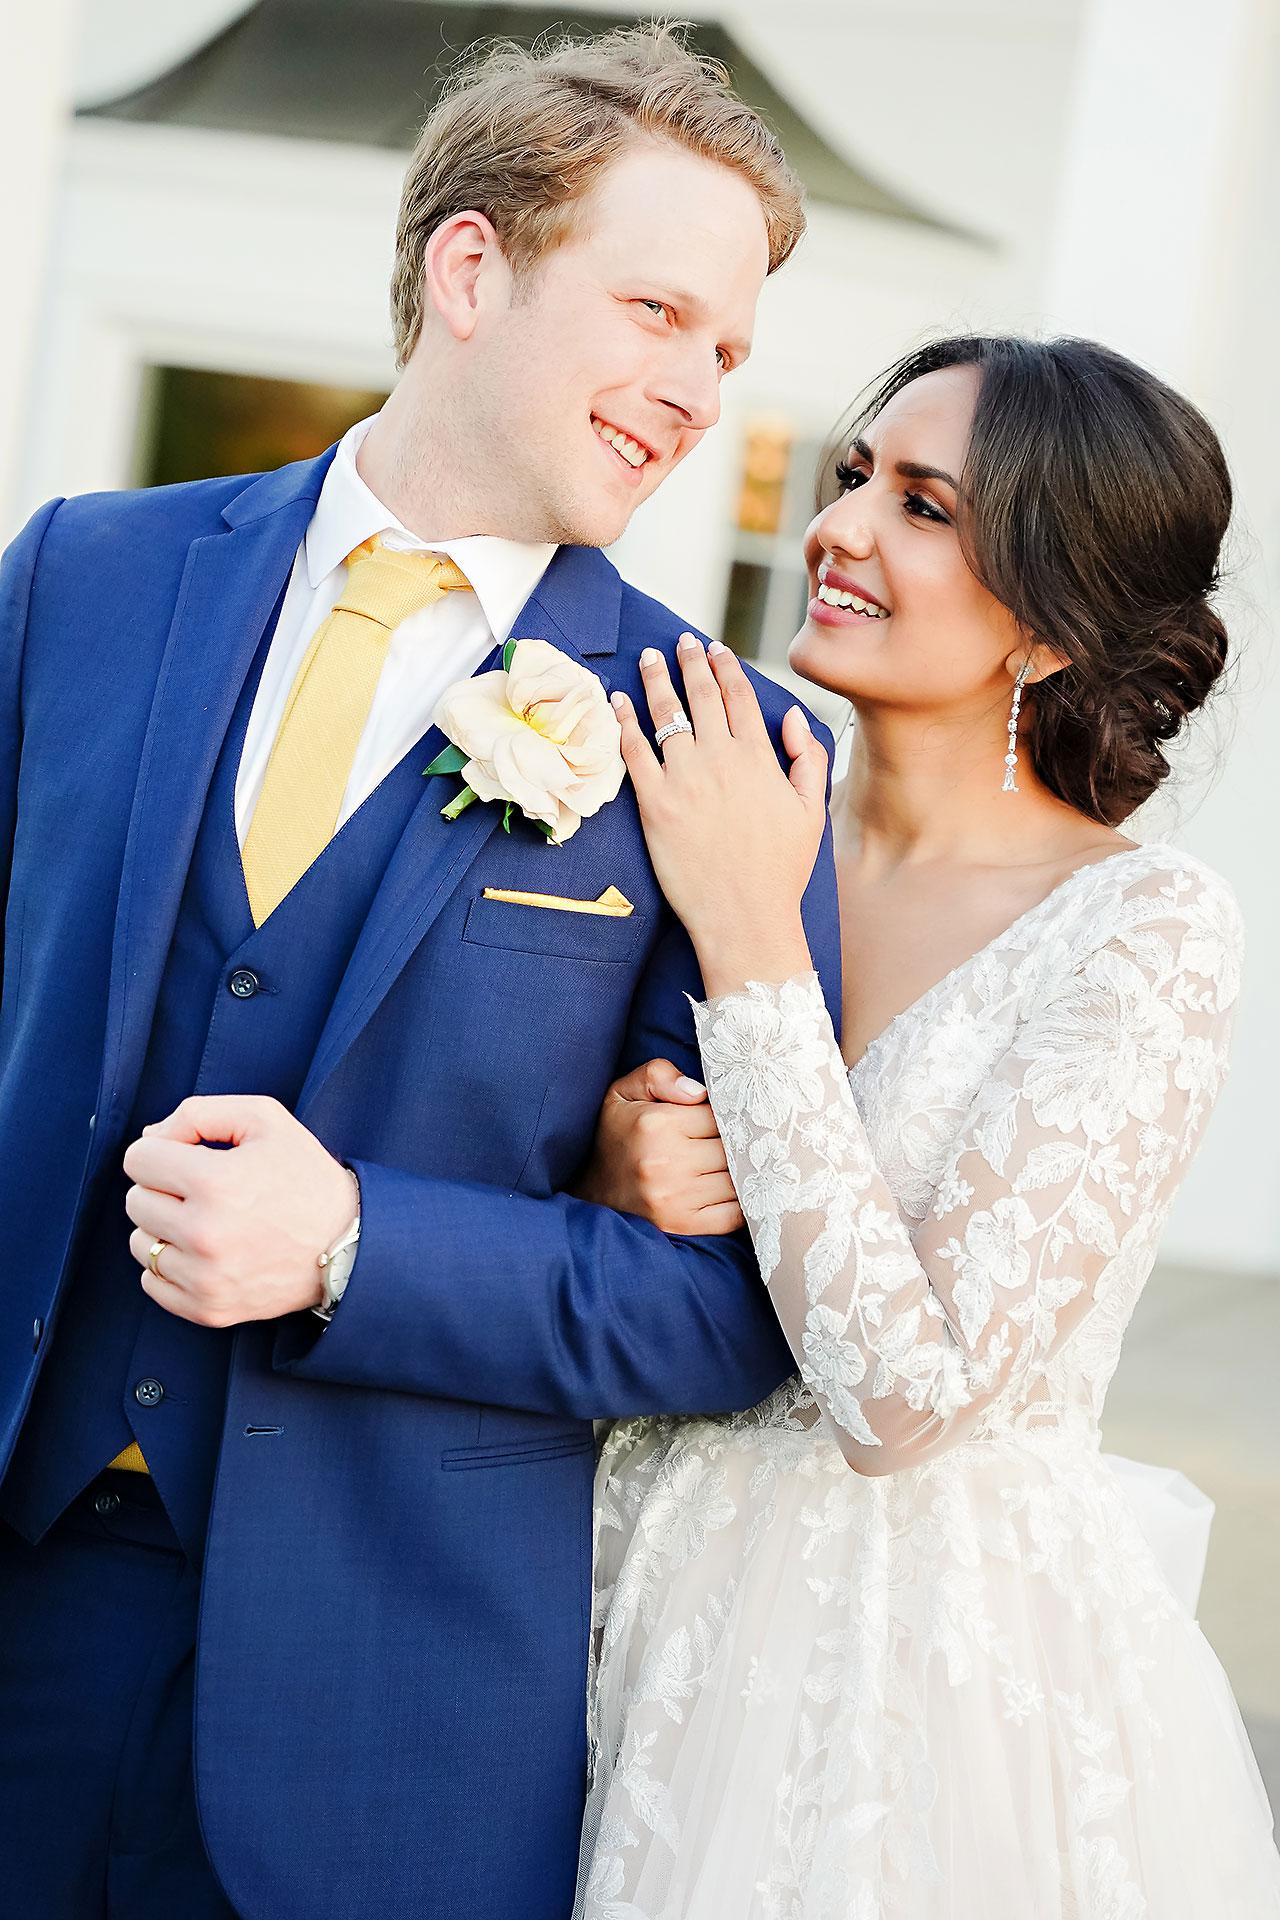 Nadia Parker Black Iris Estate Carmel Indiana Wedding May 2021 277